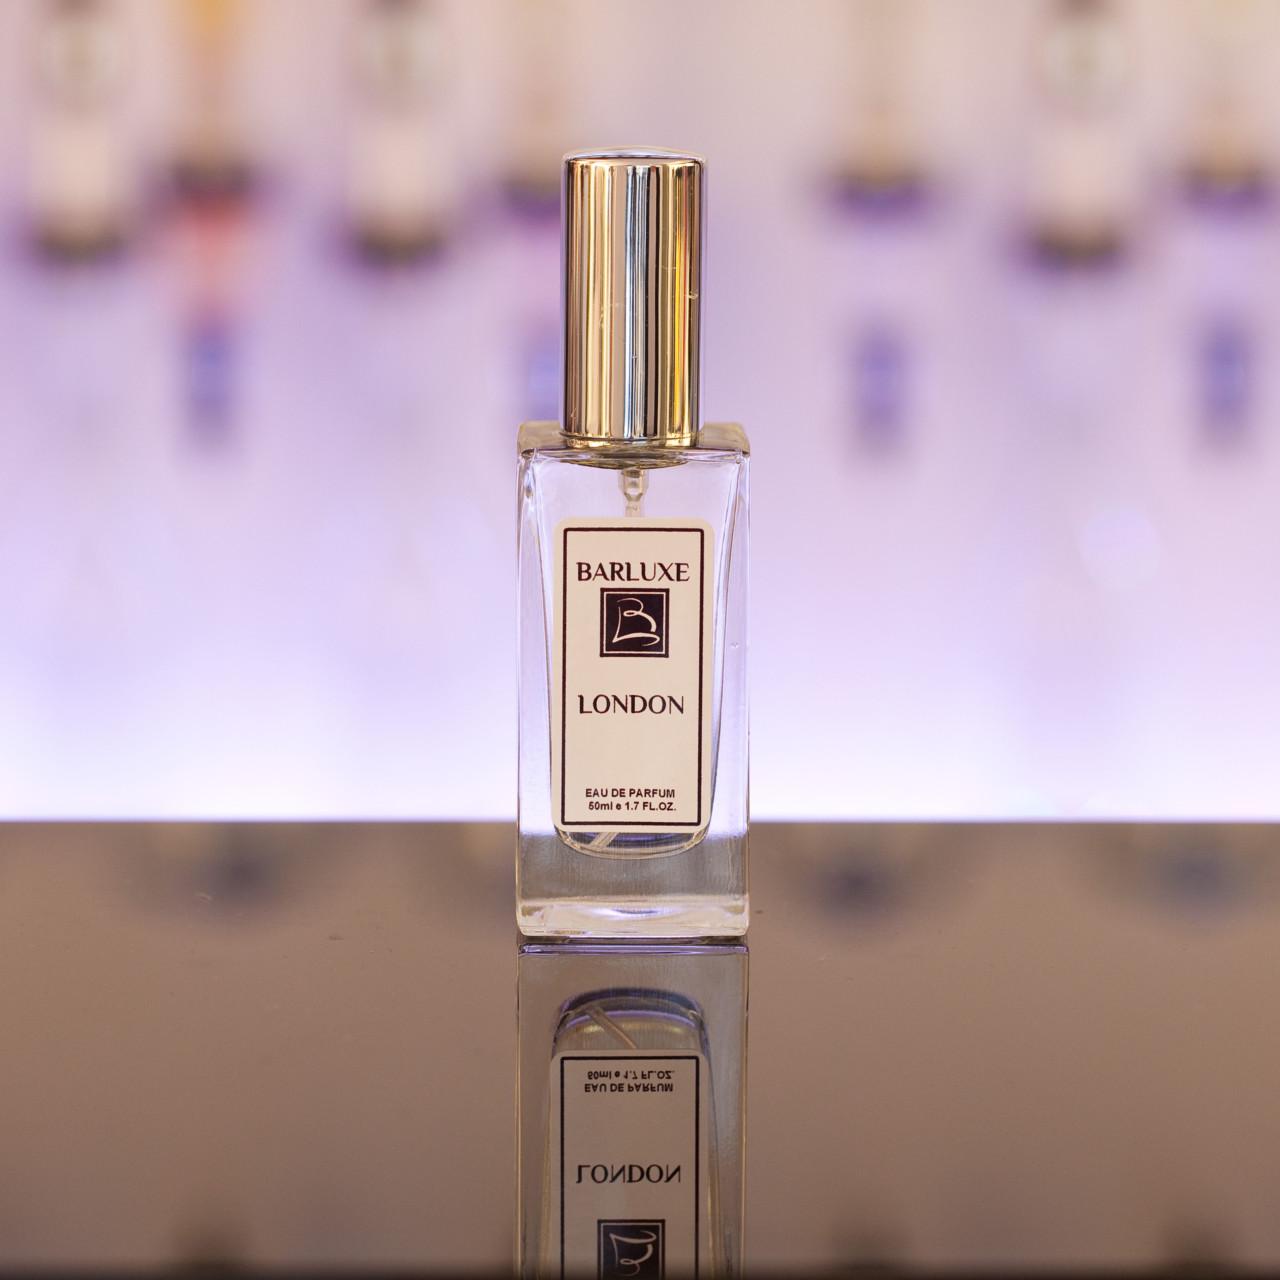 herren-parfum-dupe-double-duft-duftzwilling-london